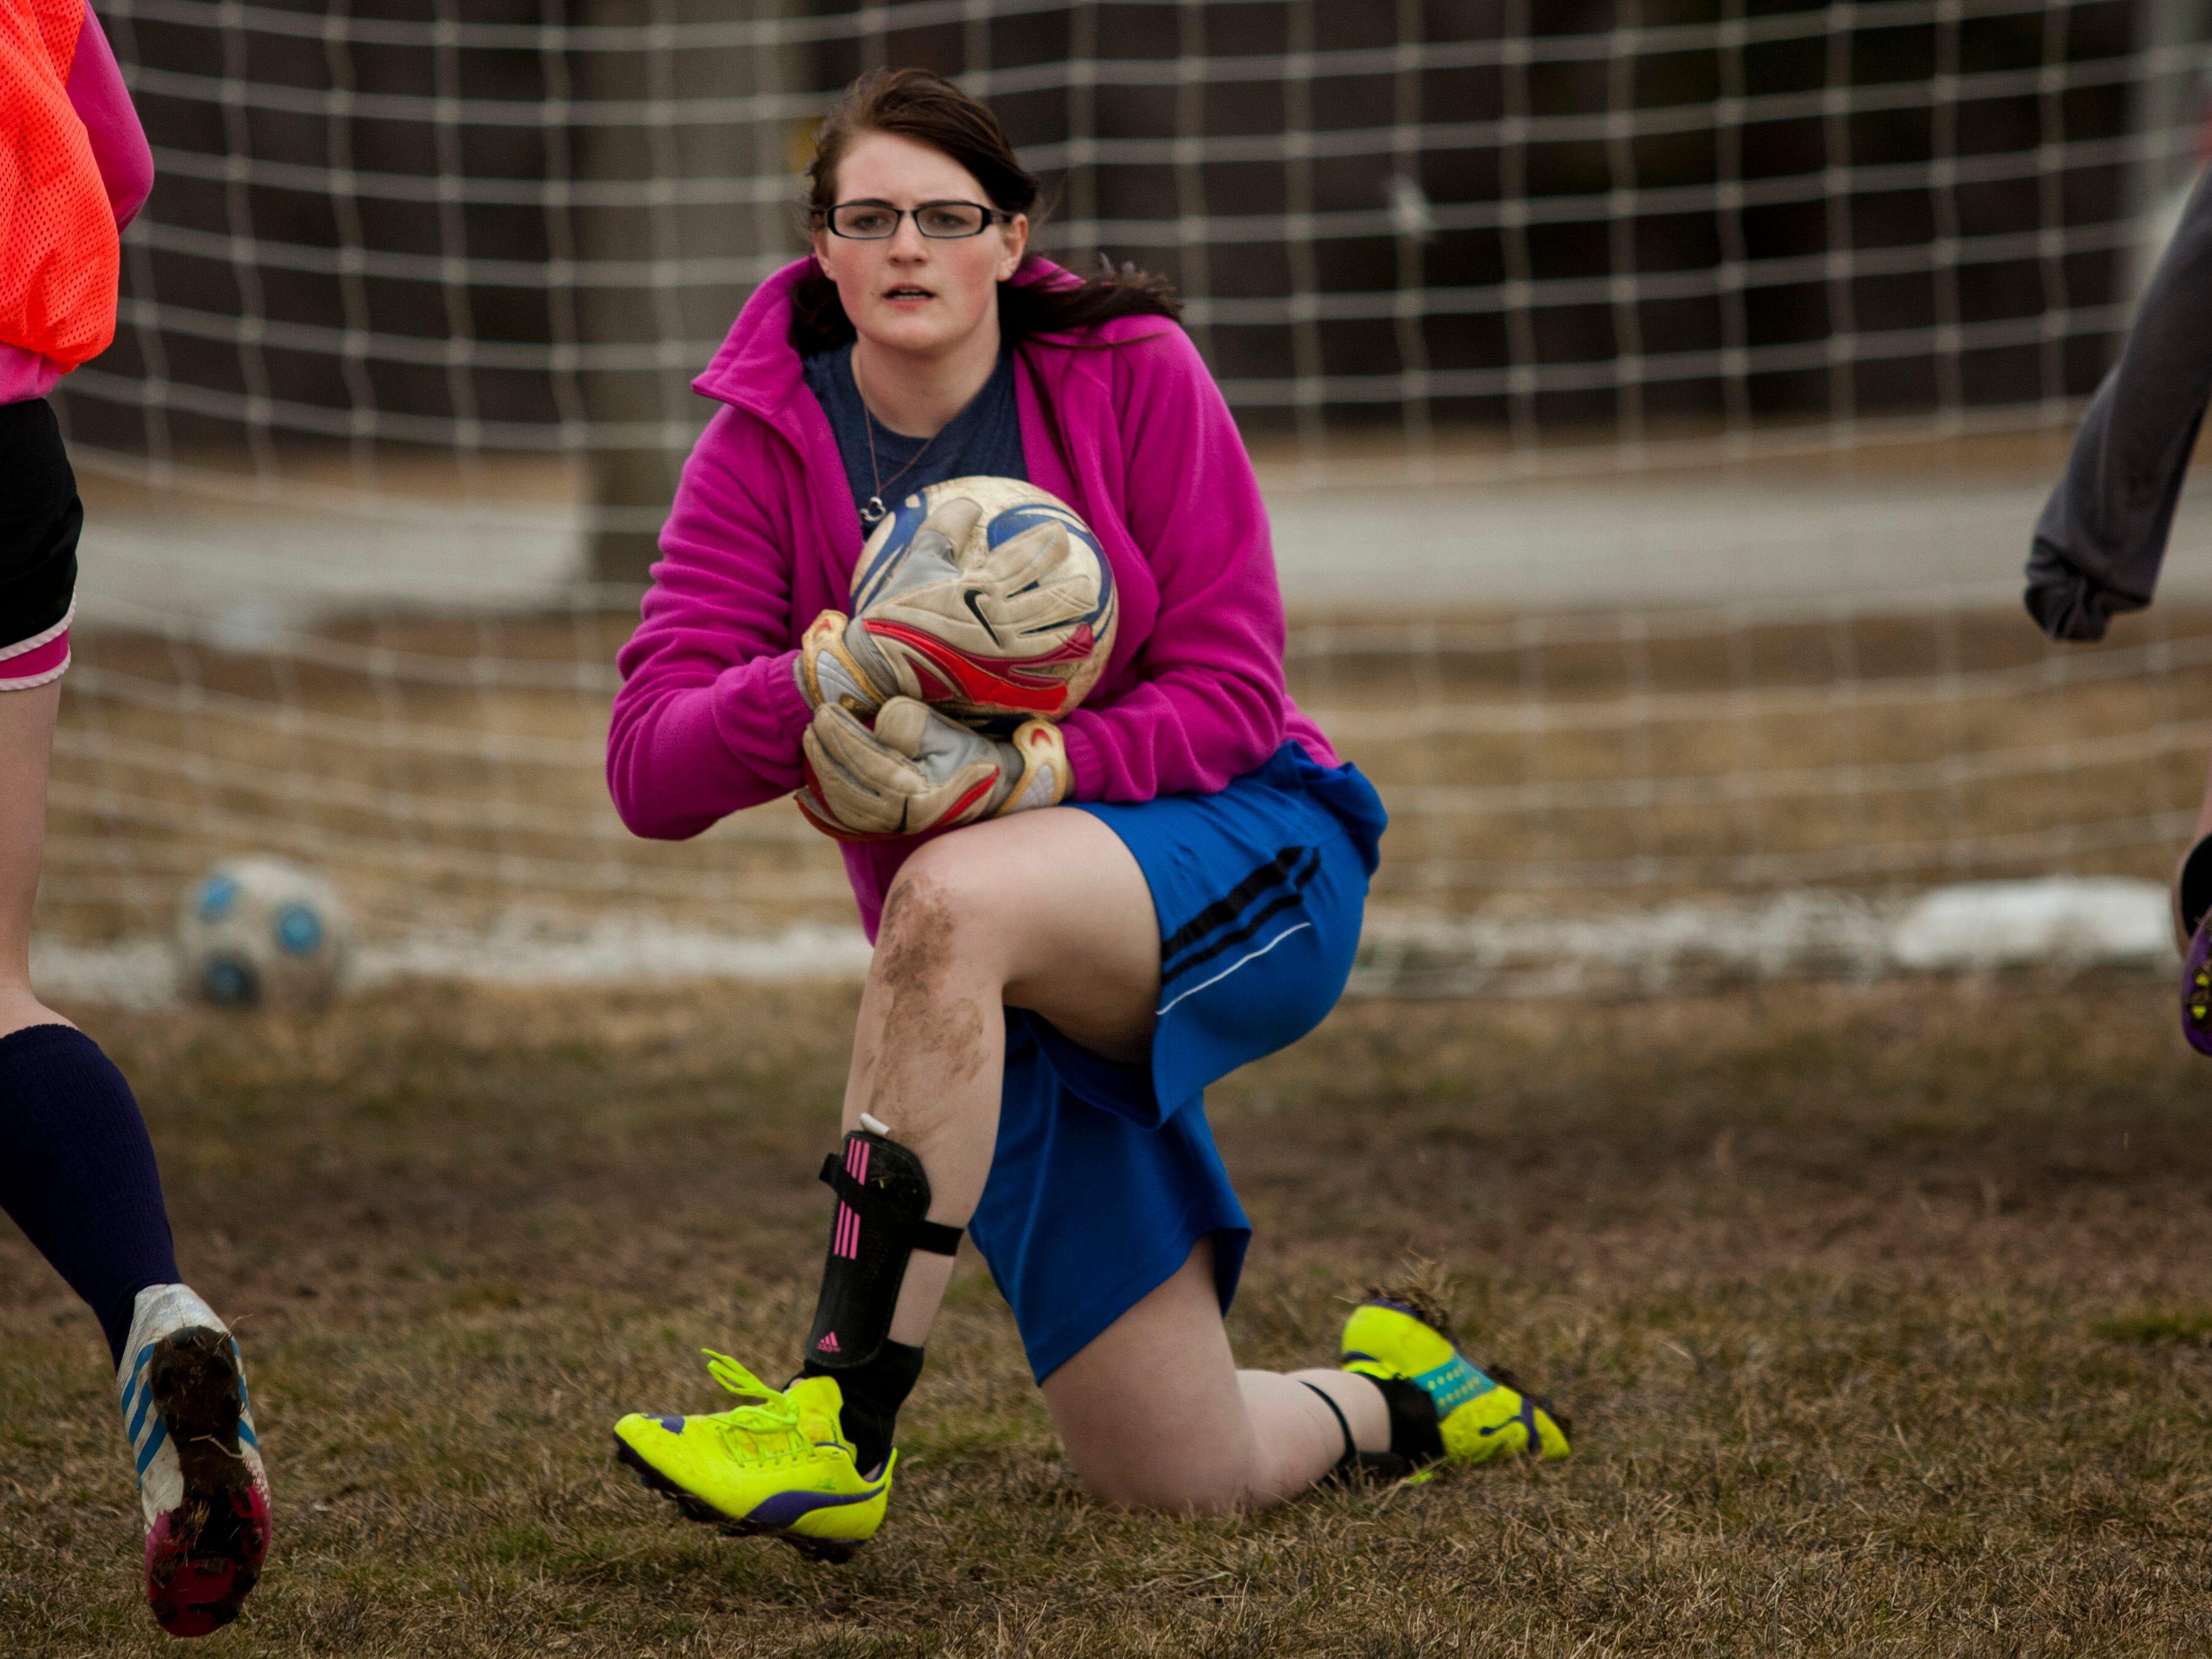 Junior goal keeper Sarah Compton stops a shot on goal during practice Thursday at Brockway Township Park.